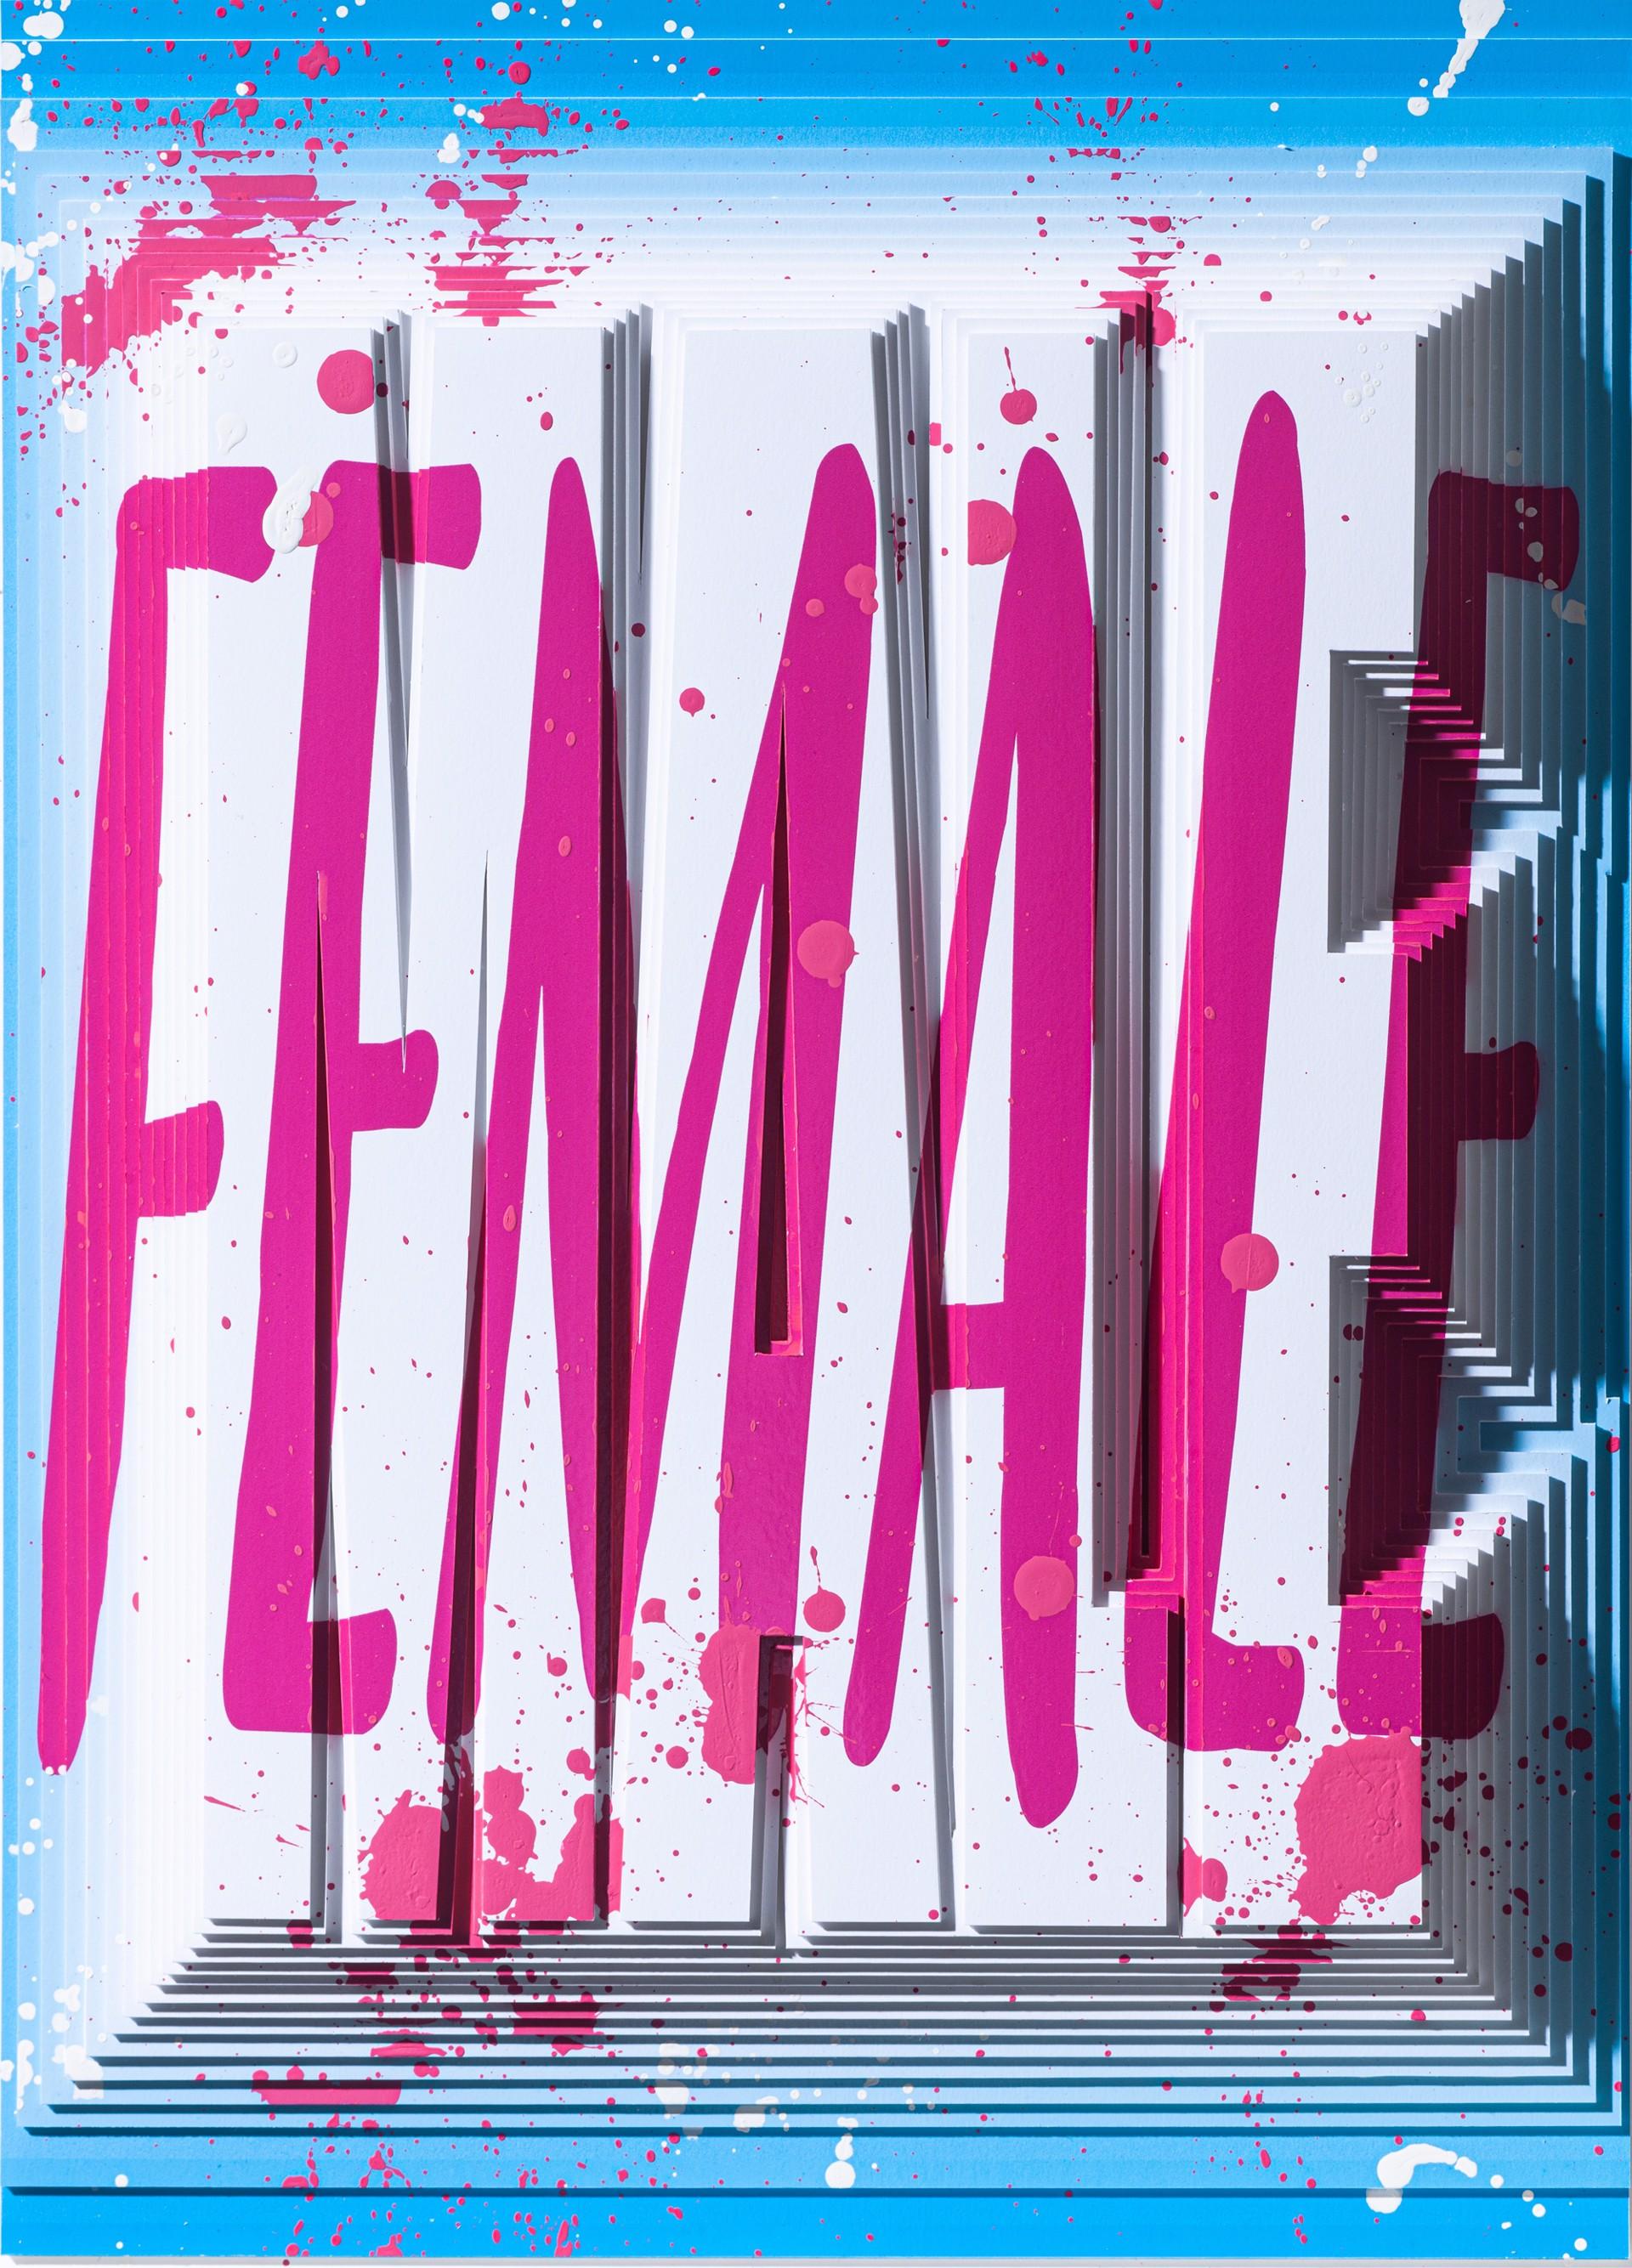 Male, Female by Hideto Yagi